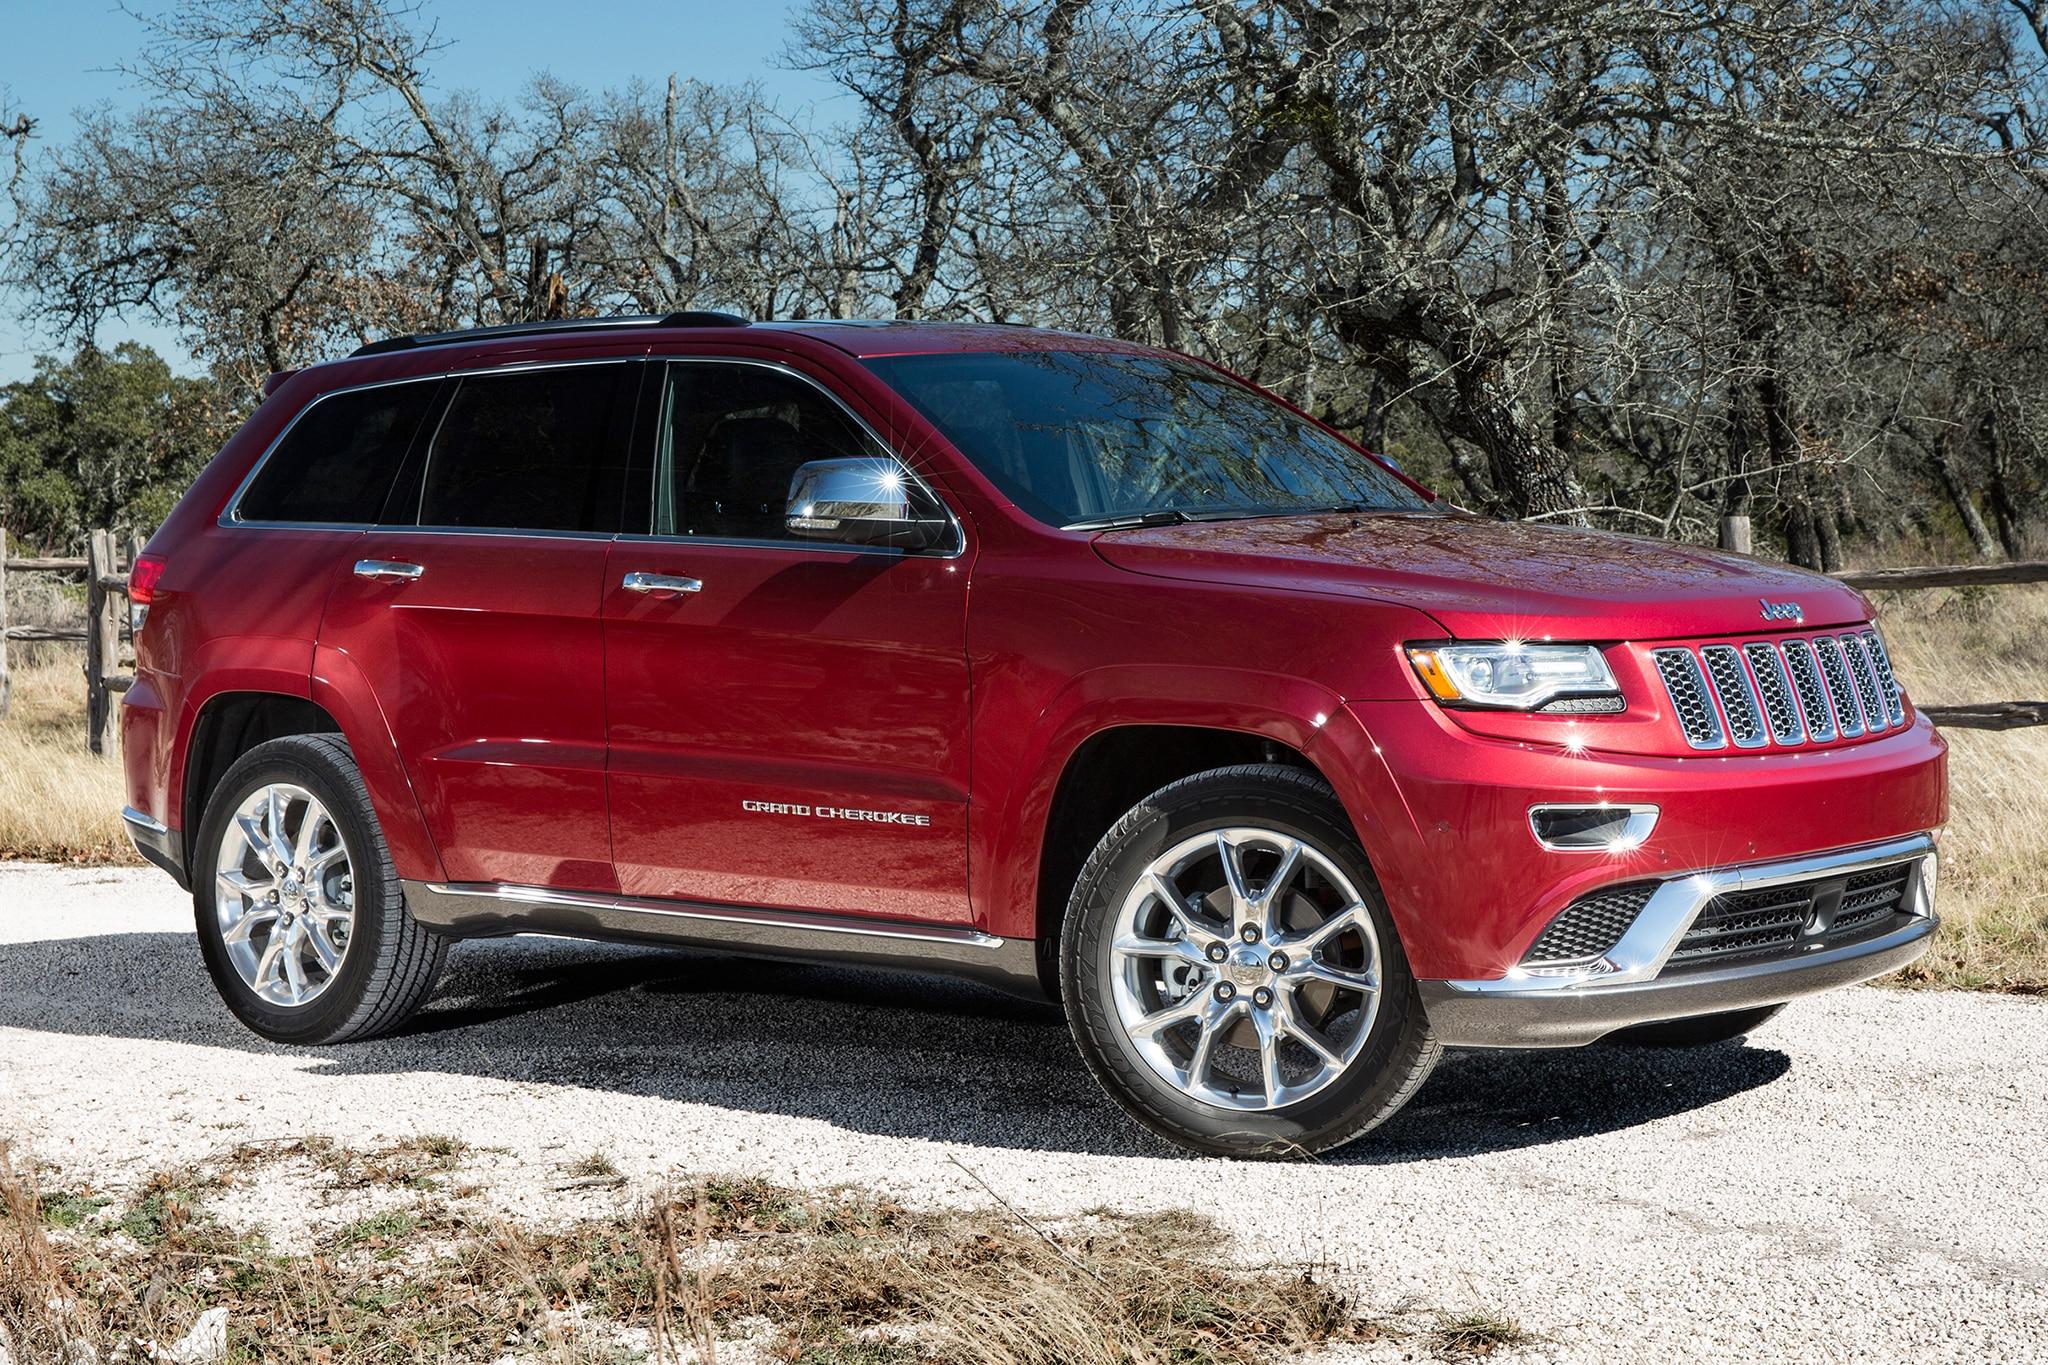 medium resolution of chrysler recalls 2011 2014 jeep grand cherokee dodge durango vanity mirror wiring